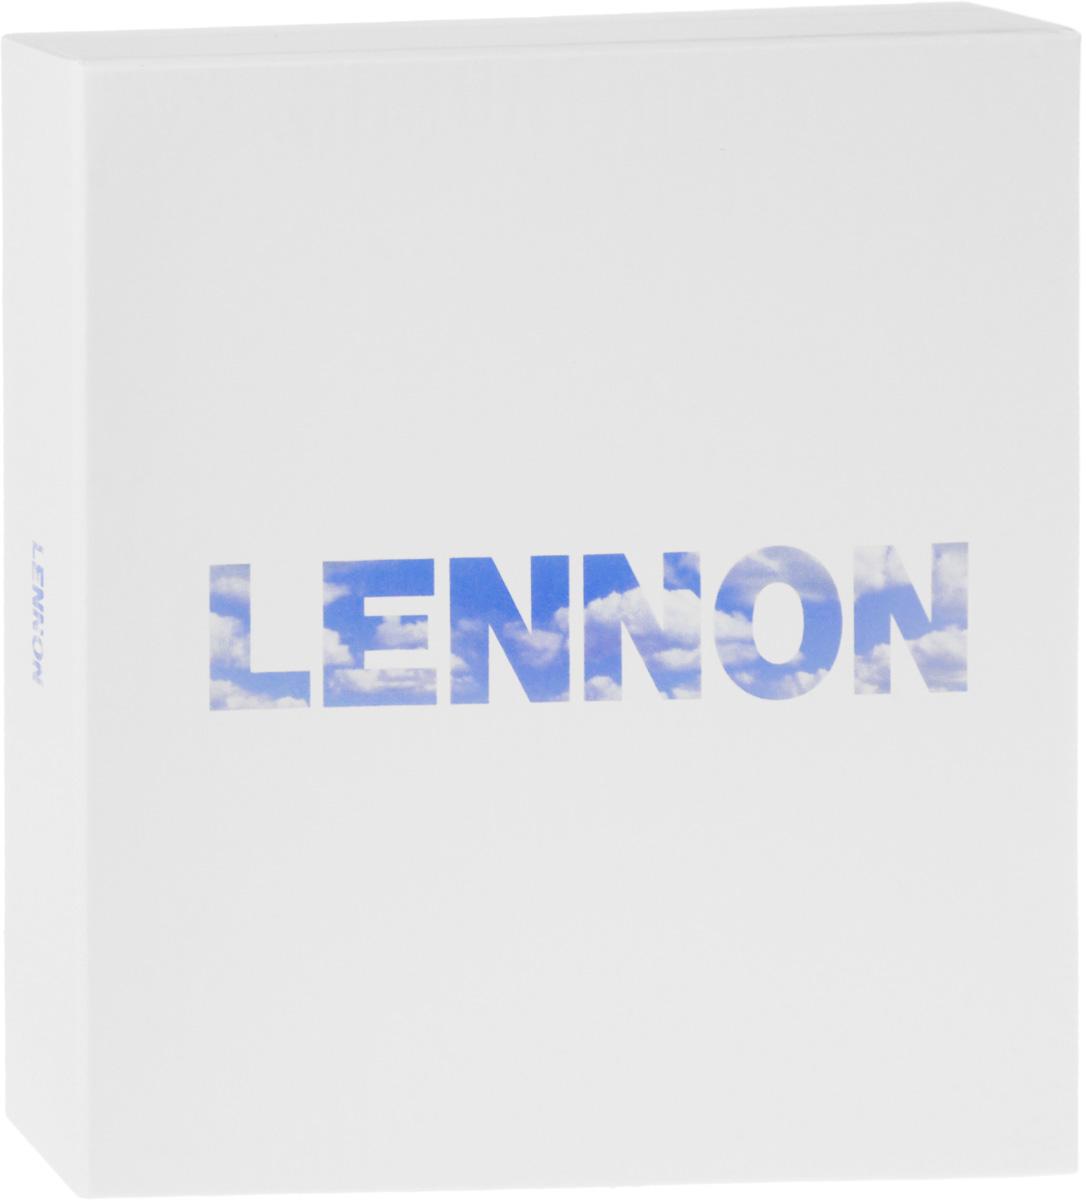 Джон Леннон,Йоко Оно John Lennon. Lennon (9 LP) binful 6 7 9 9 7 soft tablet case cover for ipad mini 2 3 4 air 1 universal liner sleeve tablets zipper pouch bag